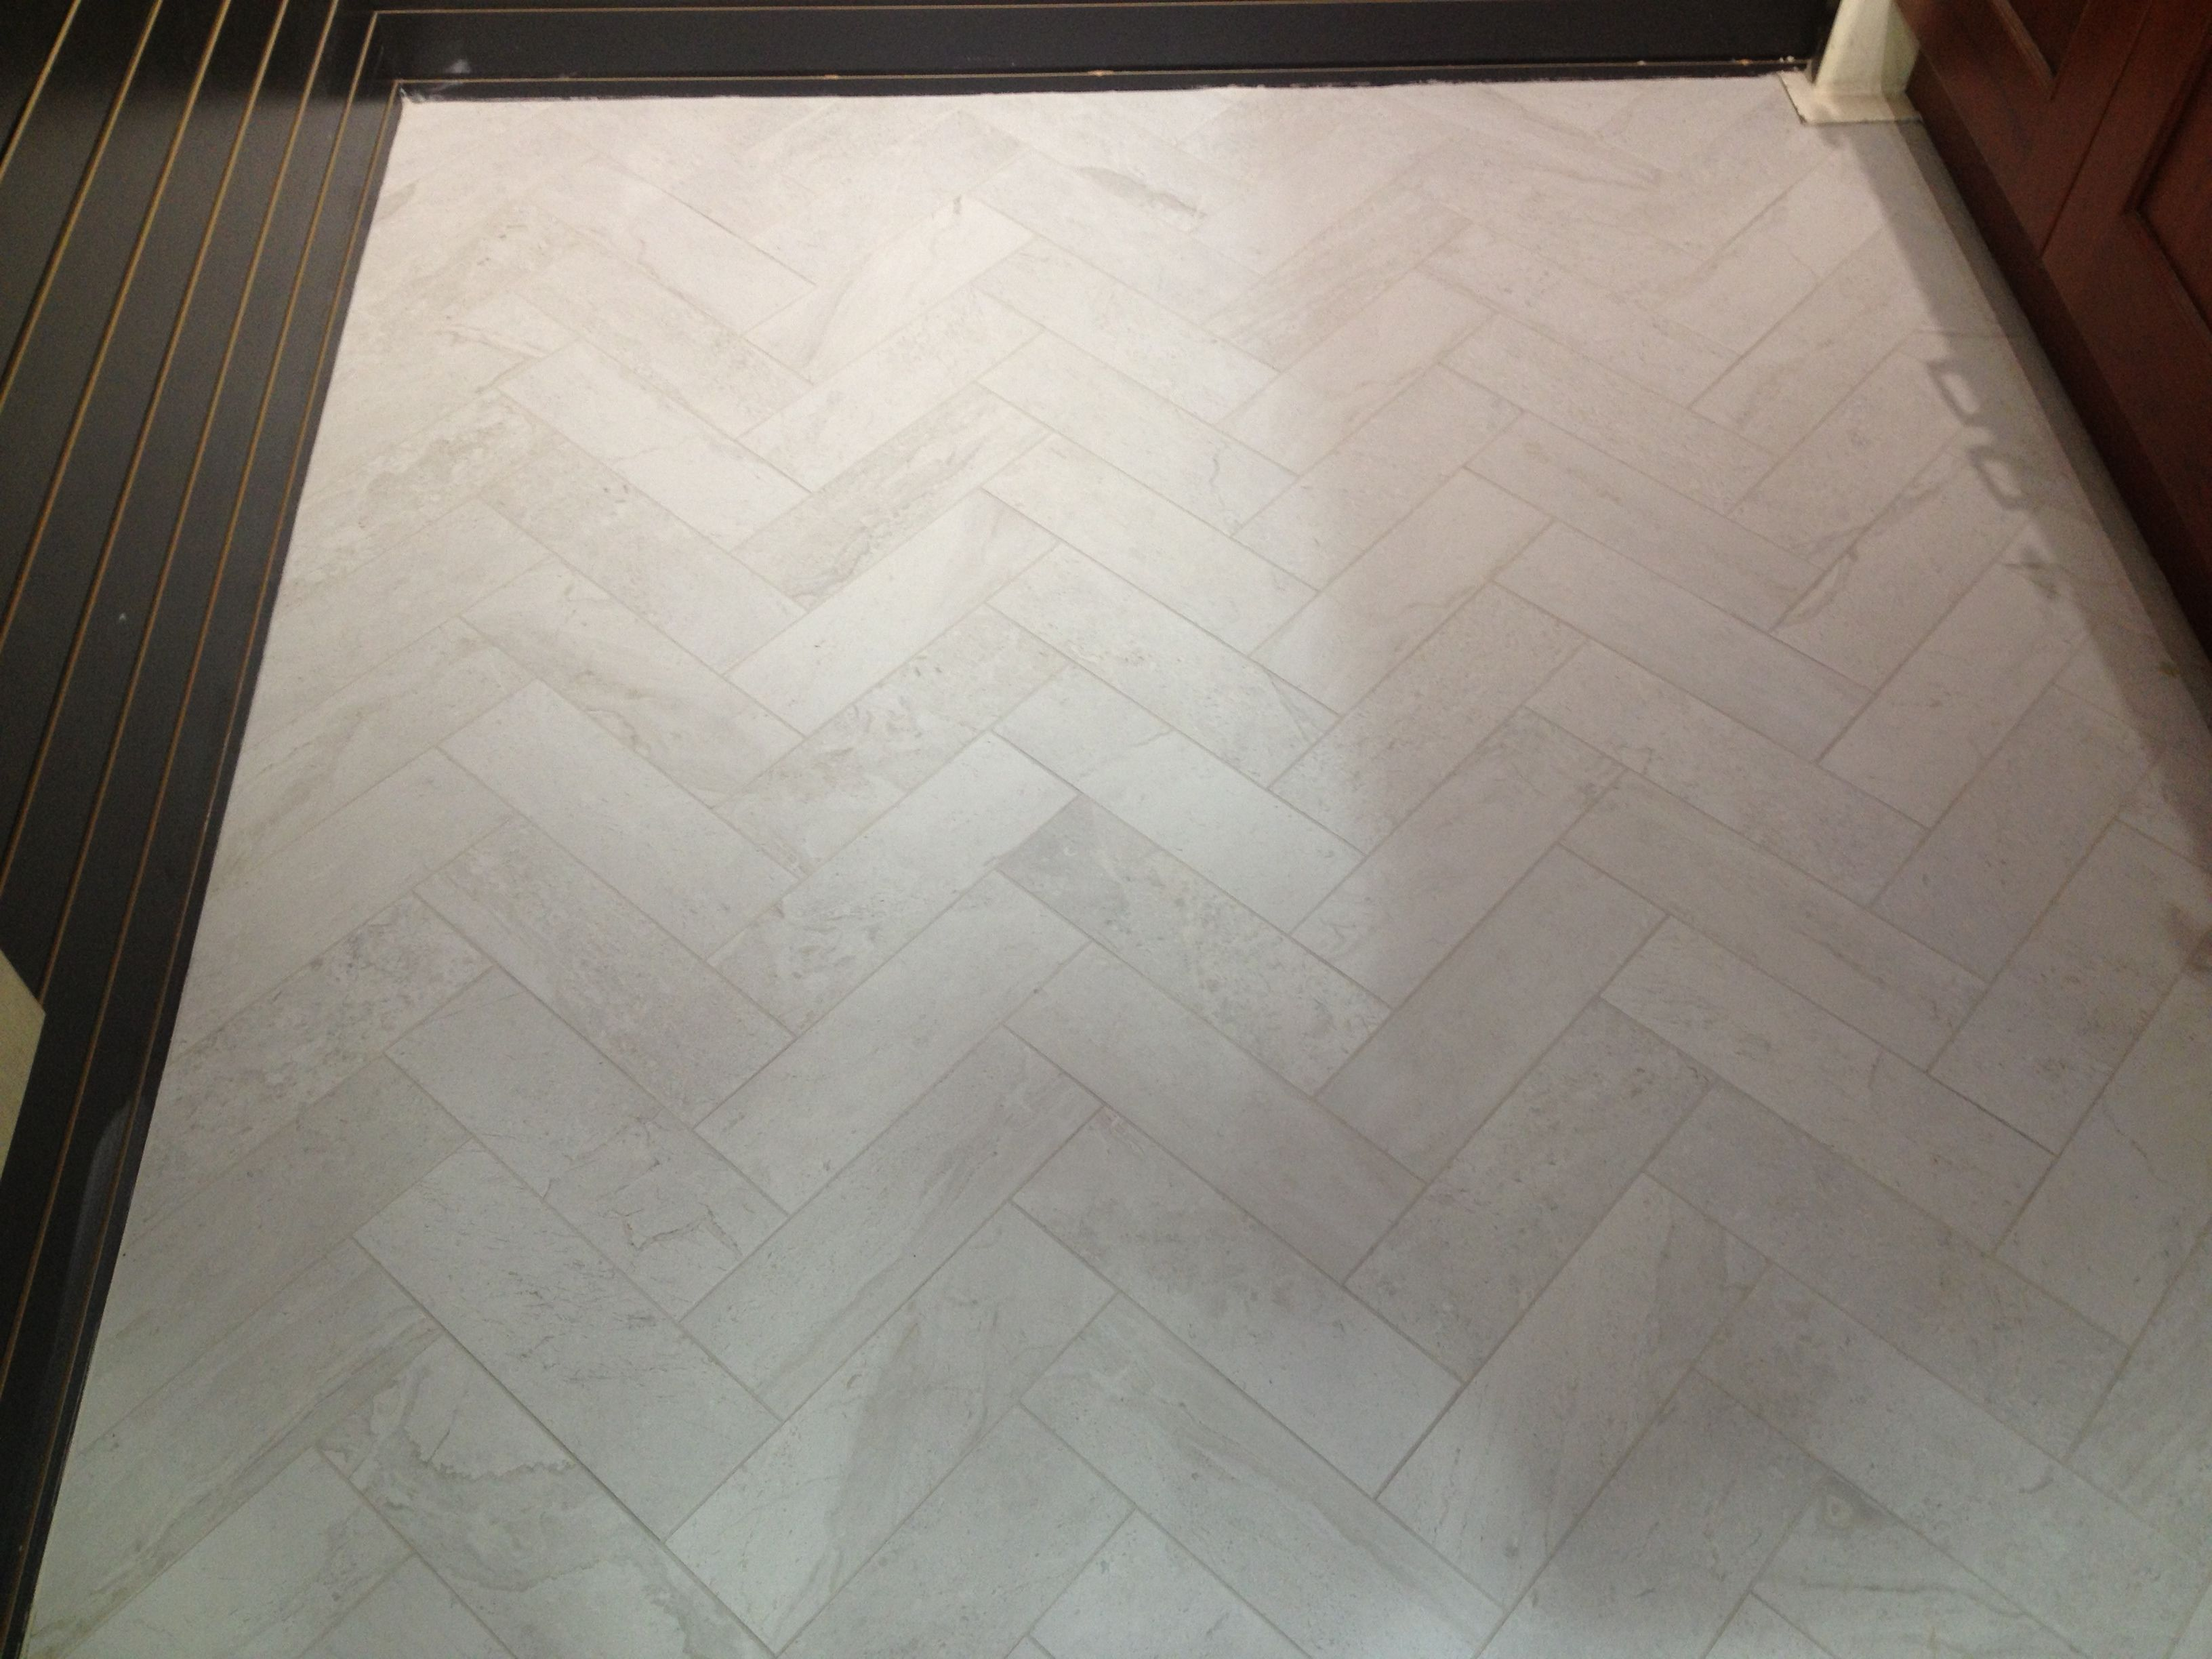 4x12 Herringbone Tile Floor